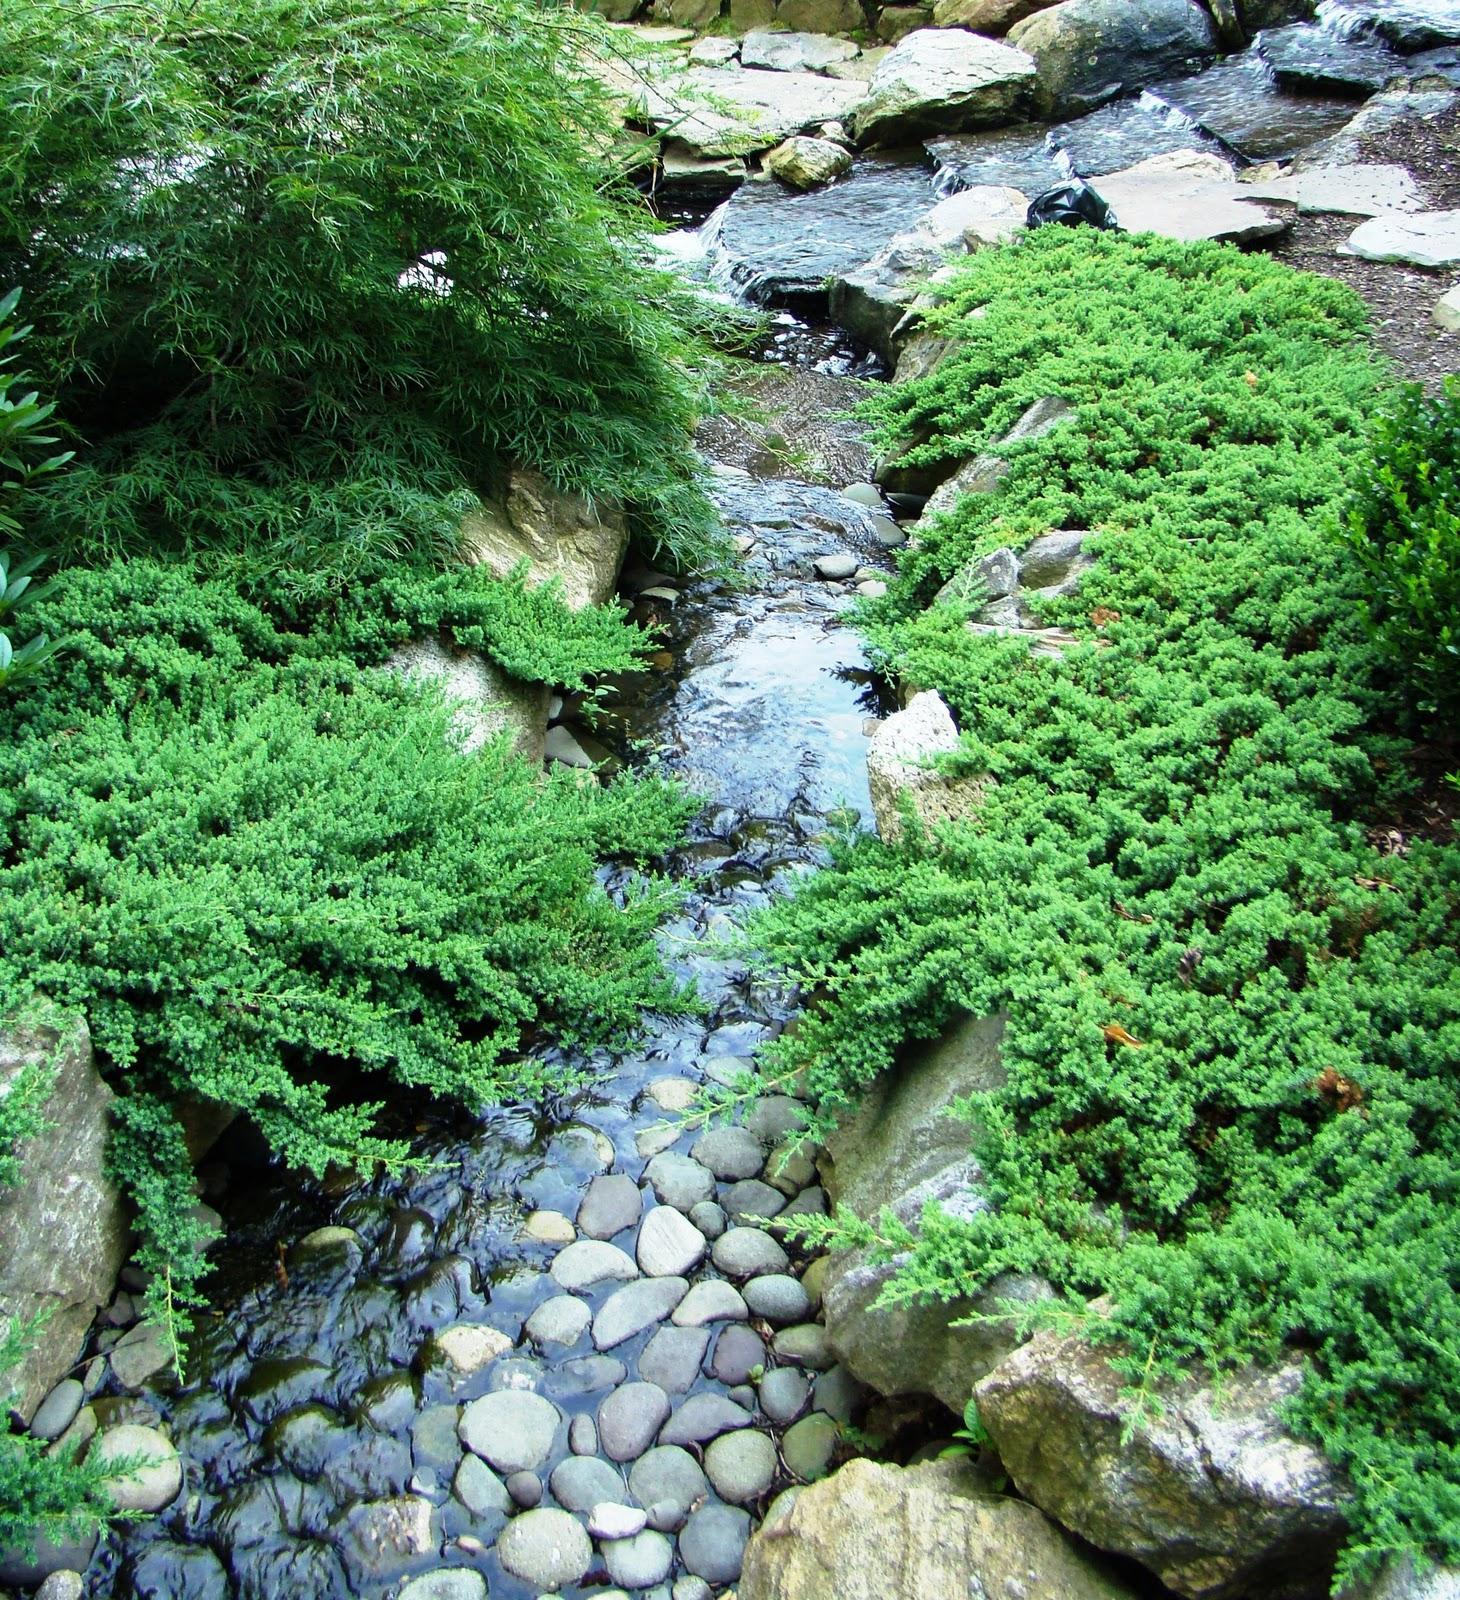 Landscape Waterfalls: A Short Video Tour